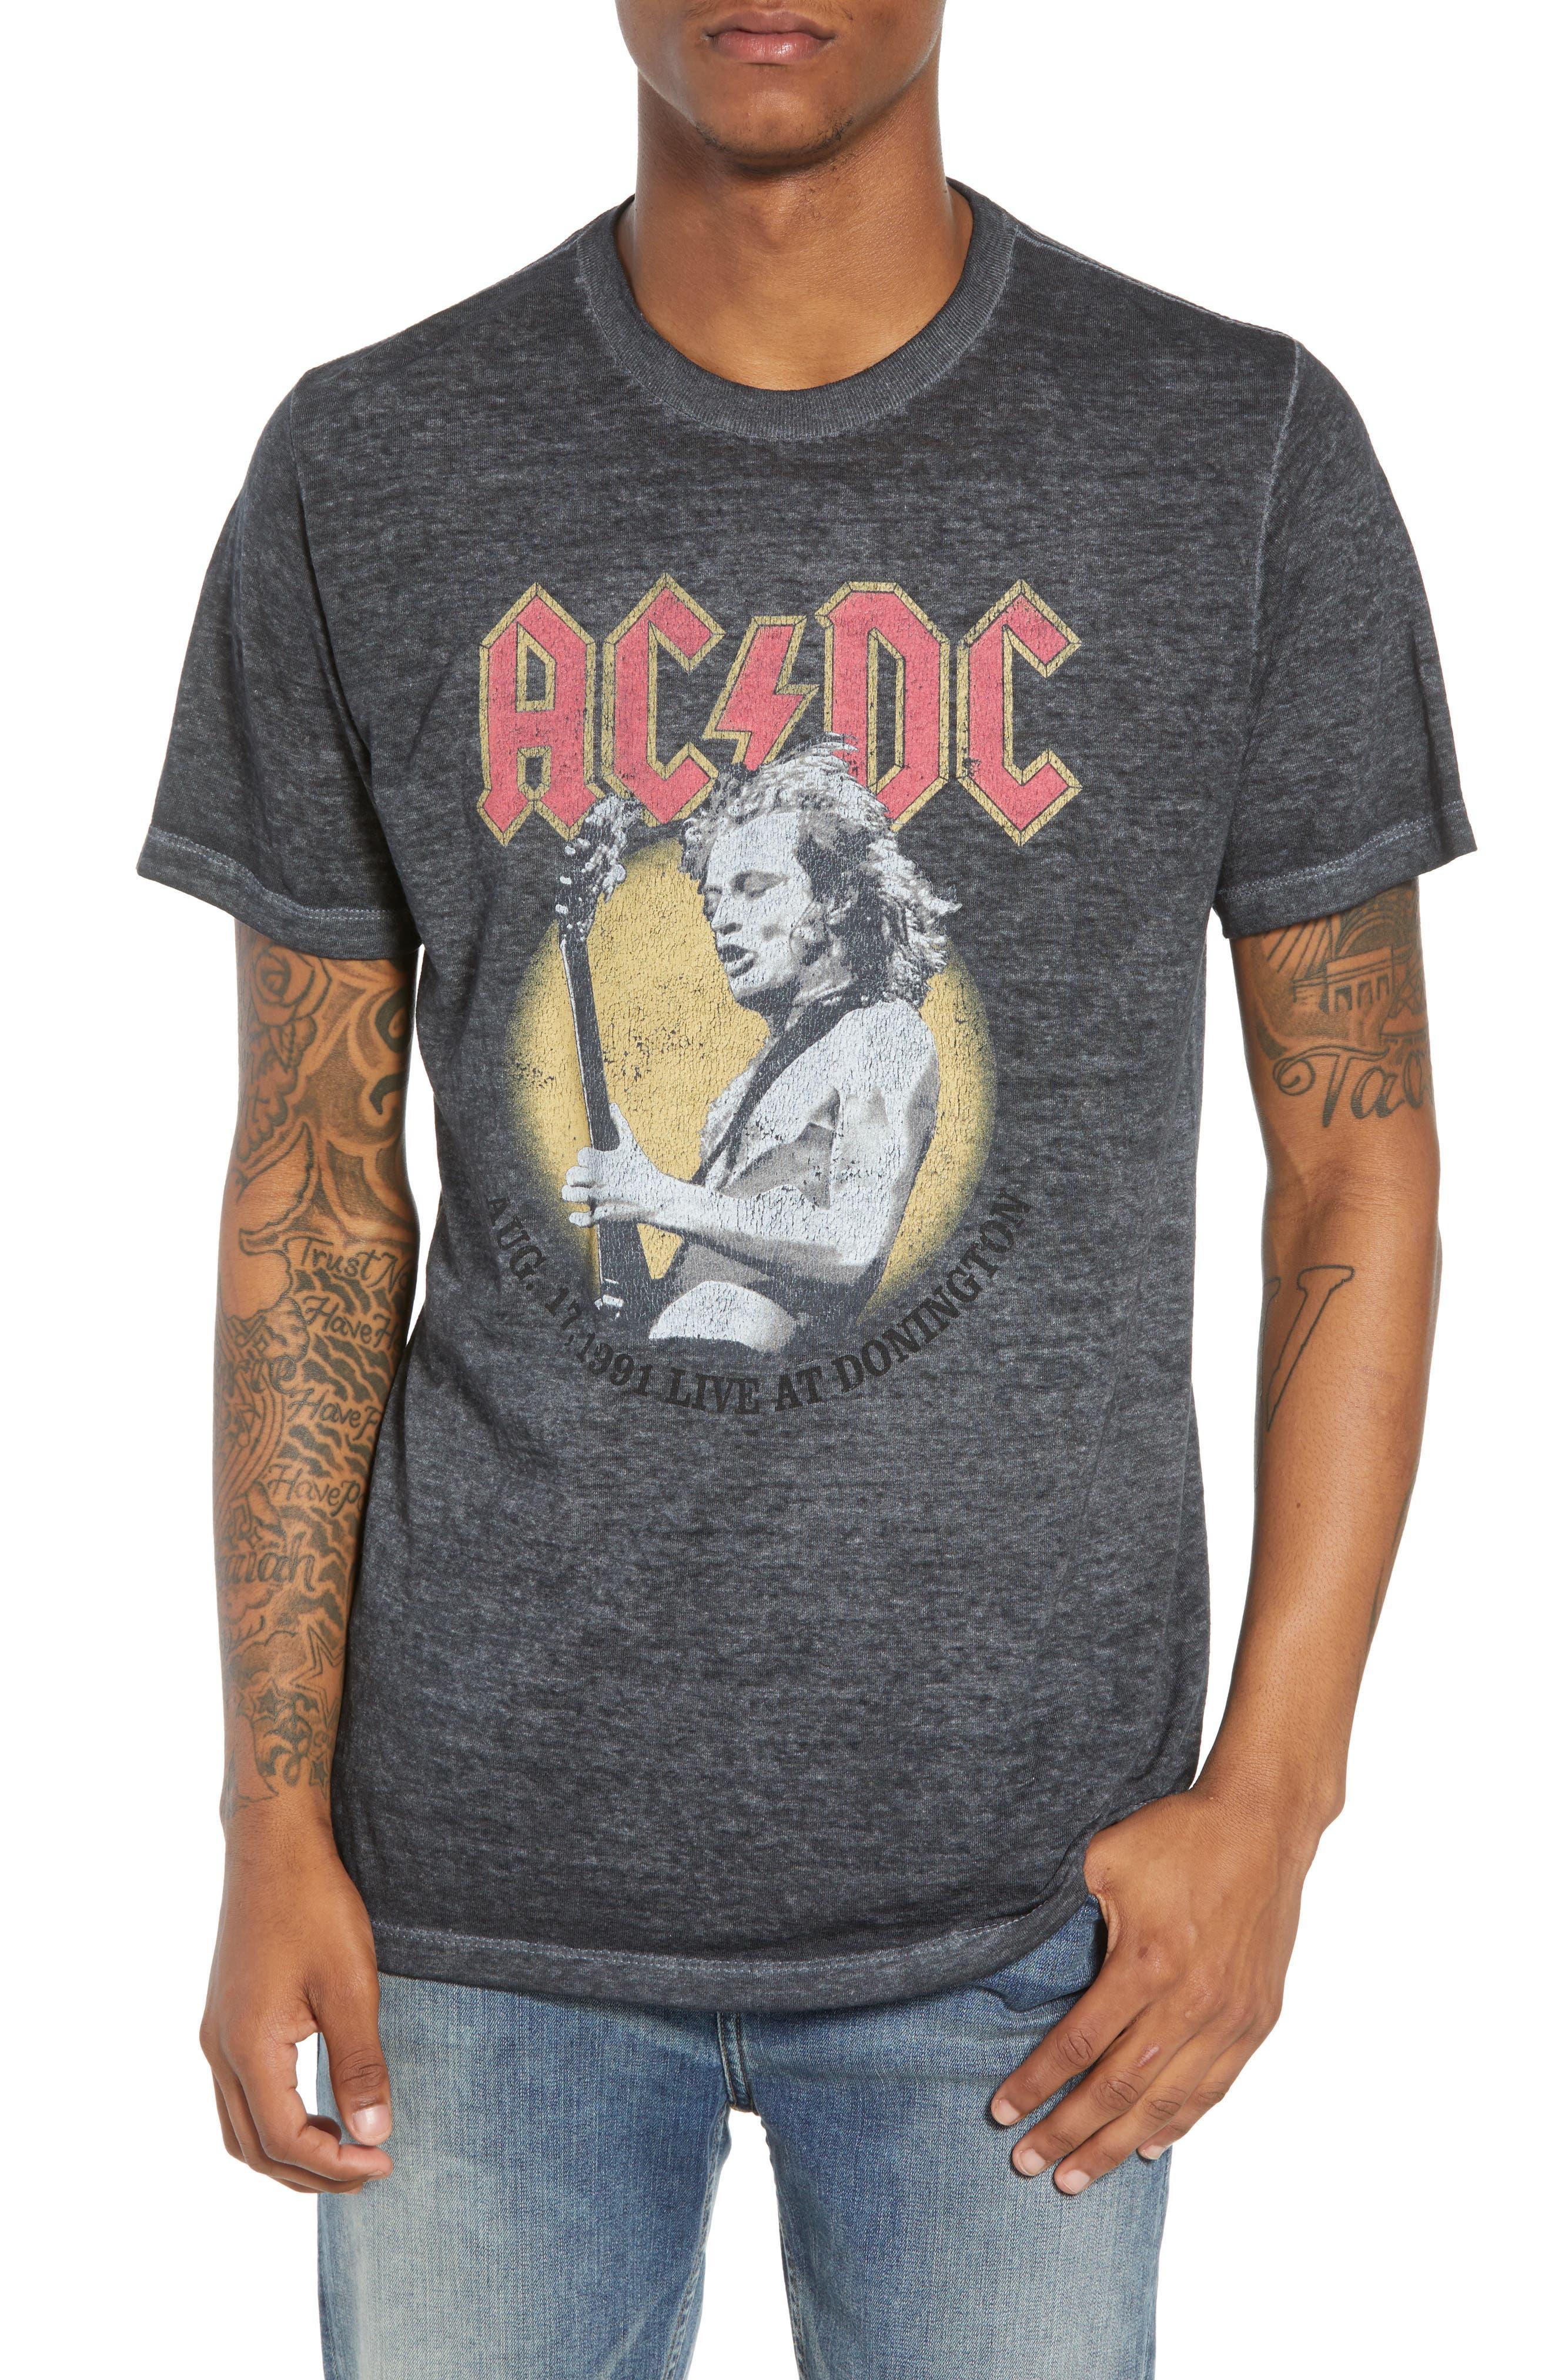 AC/DC Live at The Donington T-Shirt,                         Main,                         color, Grey Acdc Burnout